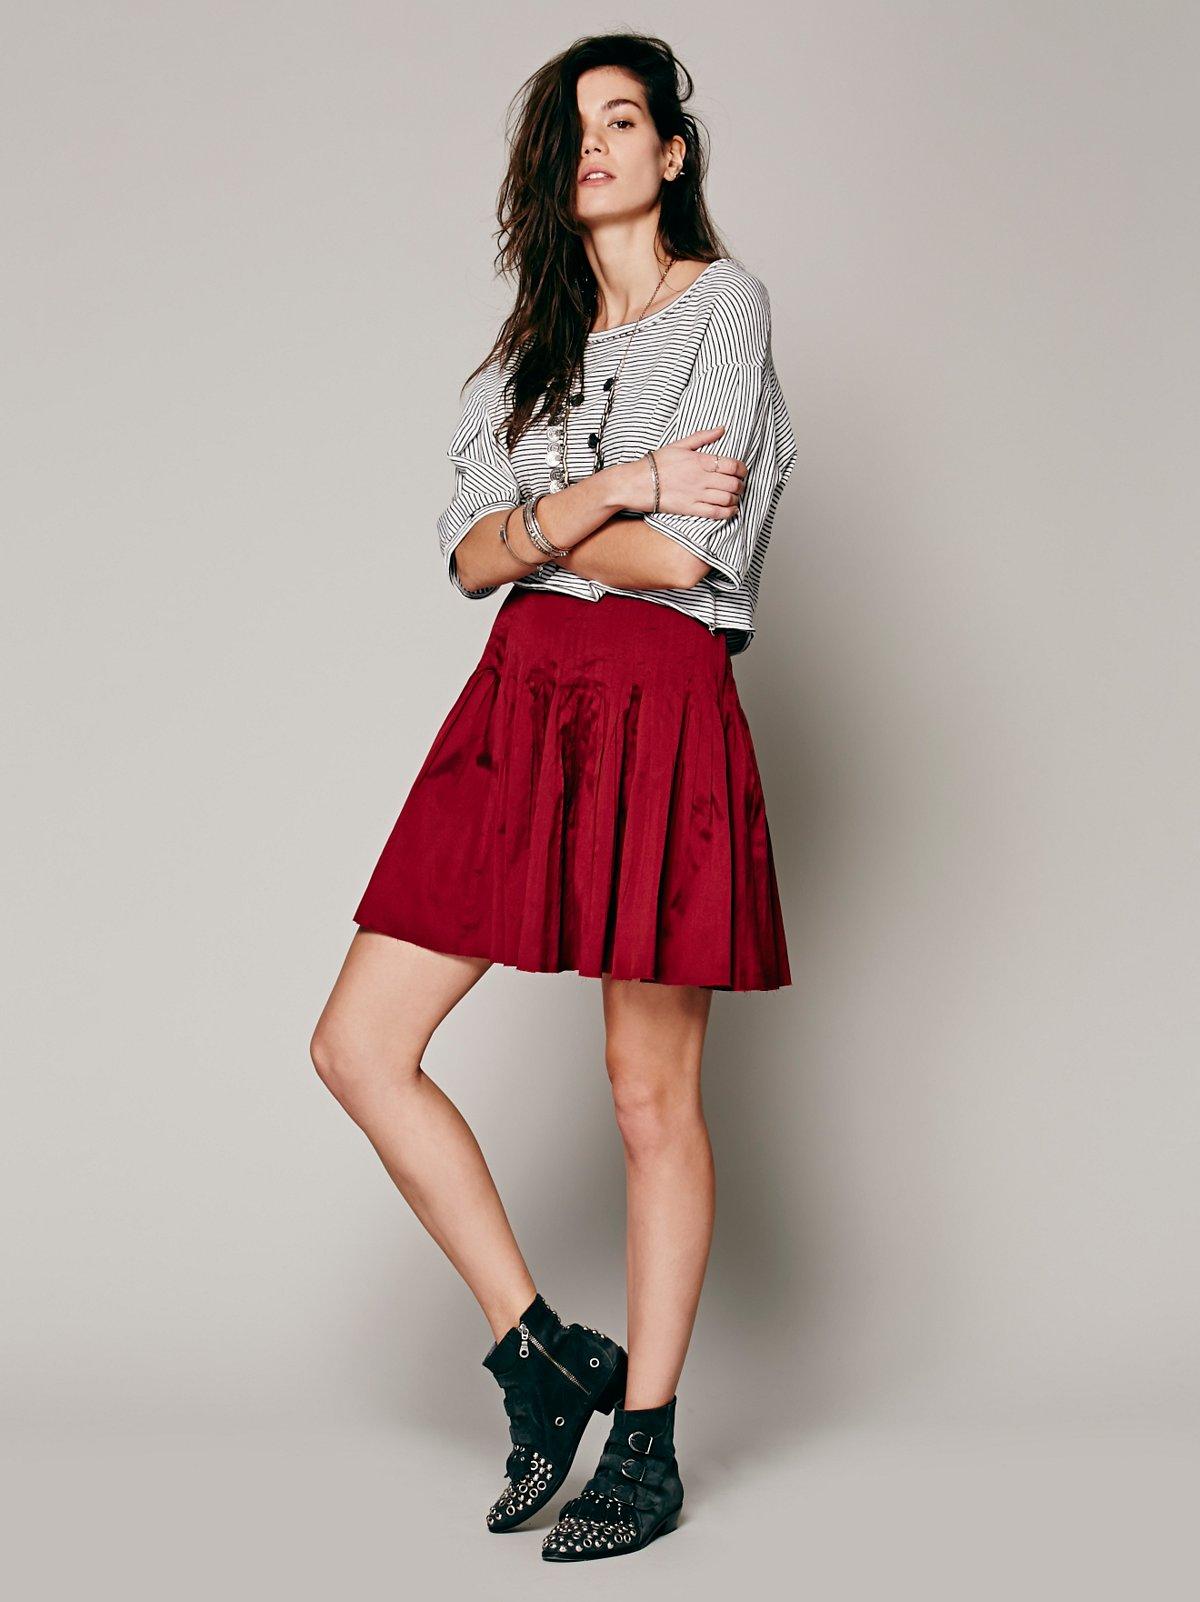 FP ONE Taffeta Mini Skirt